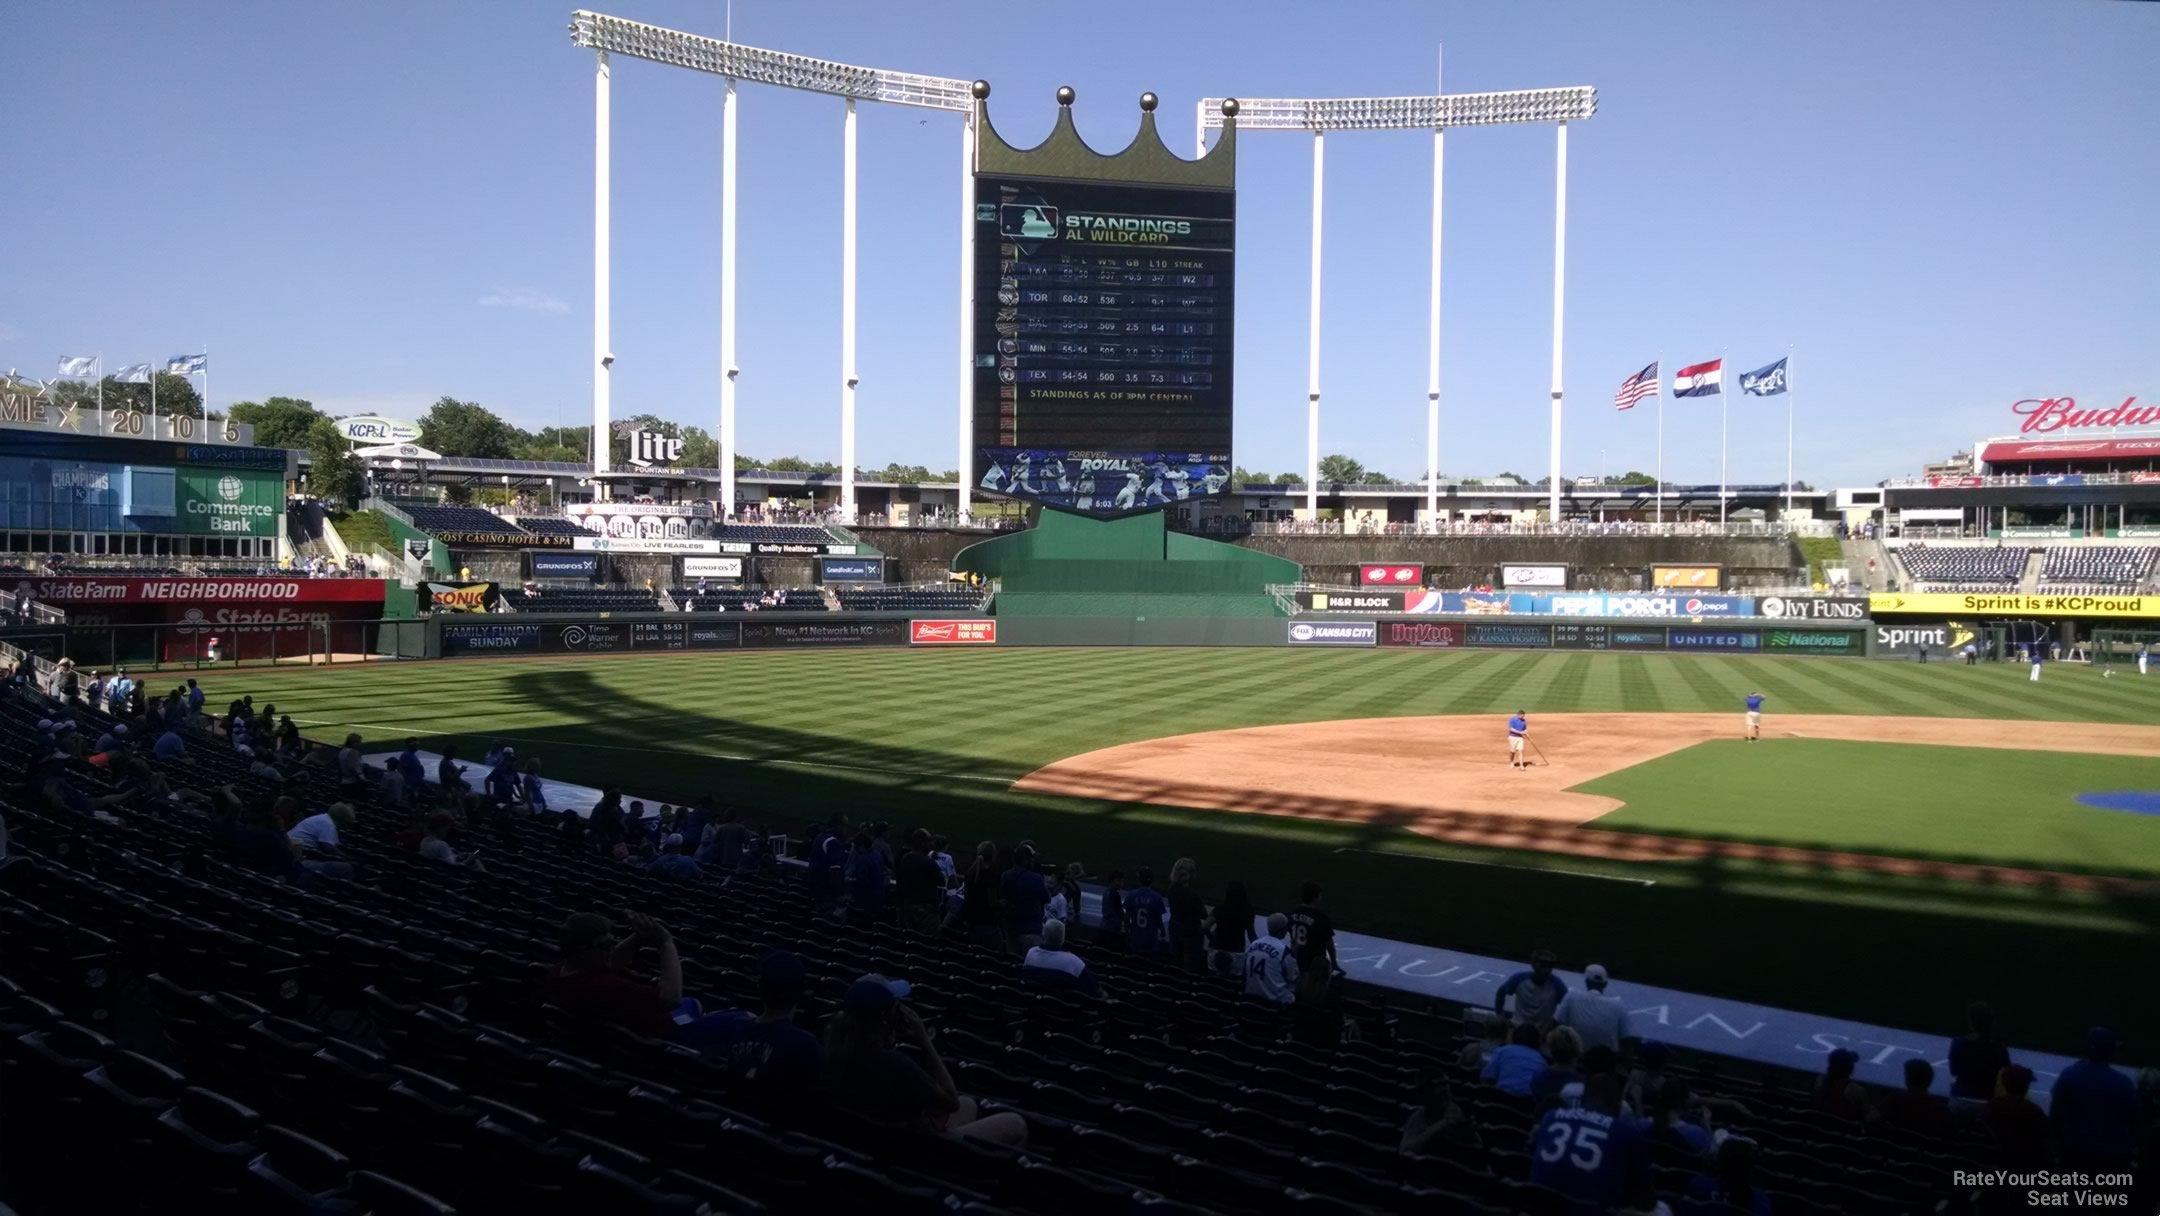 Kauffman Stadium Section 122 - RateYourSeats.com